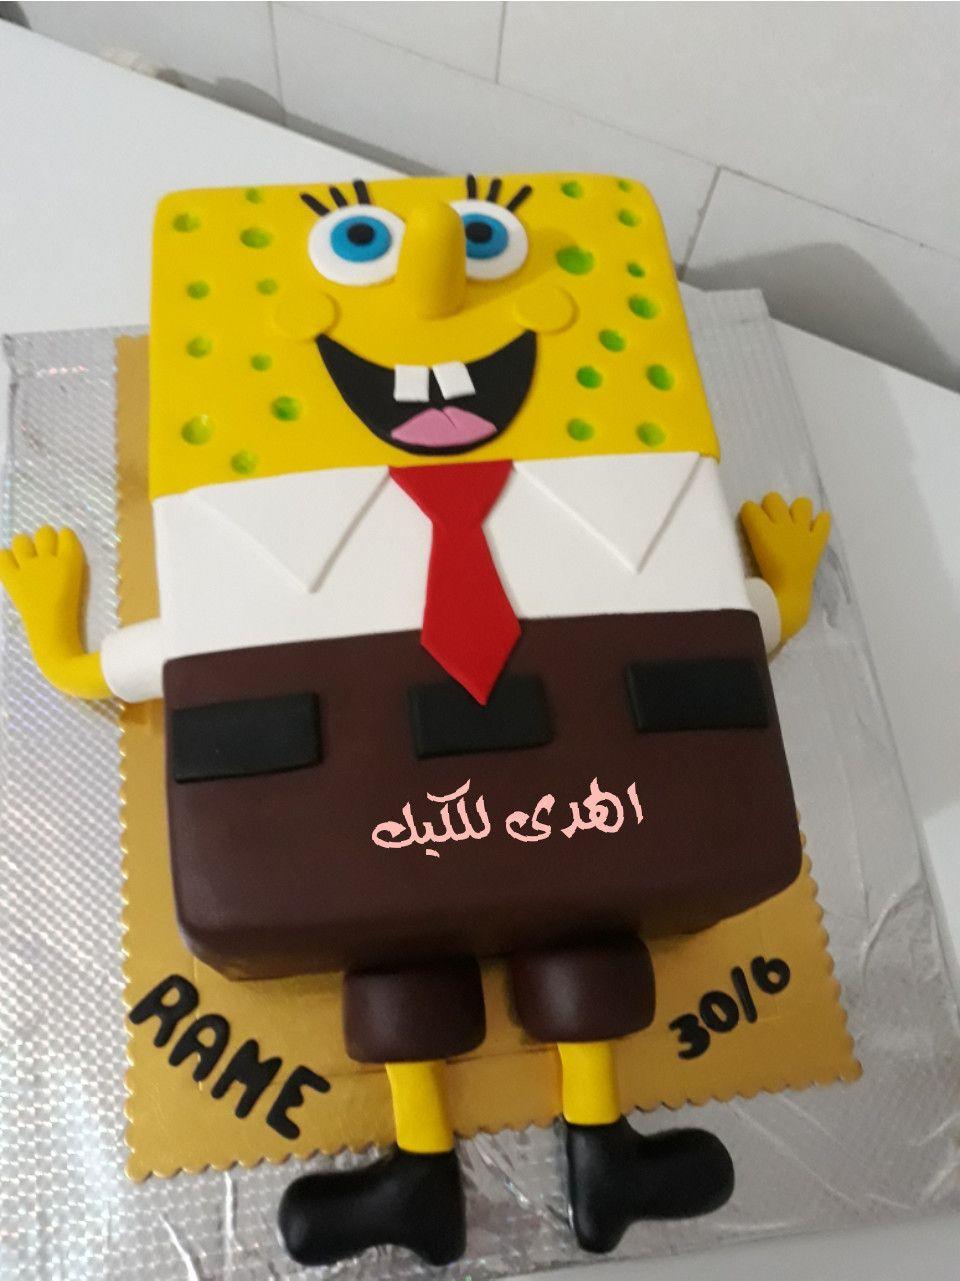 Spongebob Squarepants كيكة سبونج بوب Cake By Alhudacake Spongebob Squarepants Cake Mood Wallpaper Baby Drawing